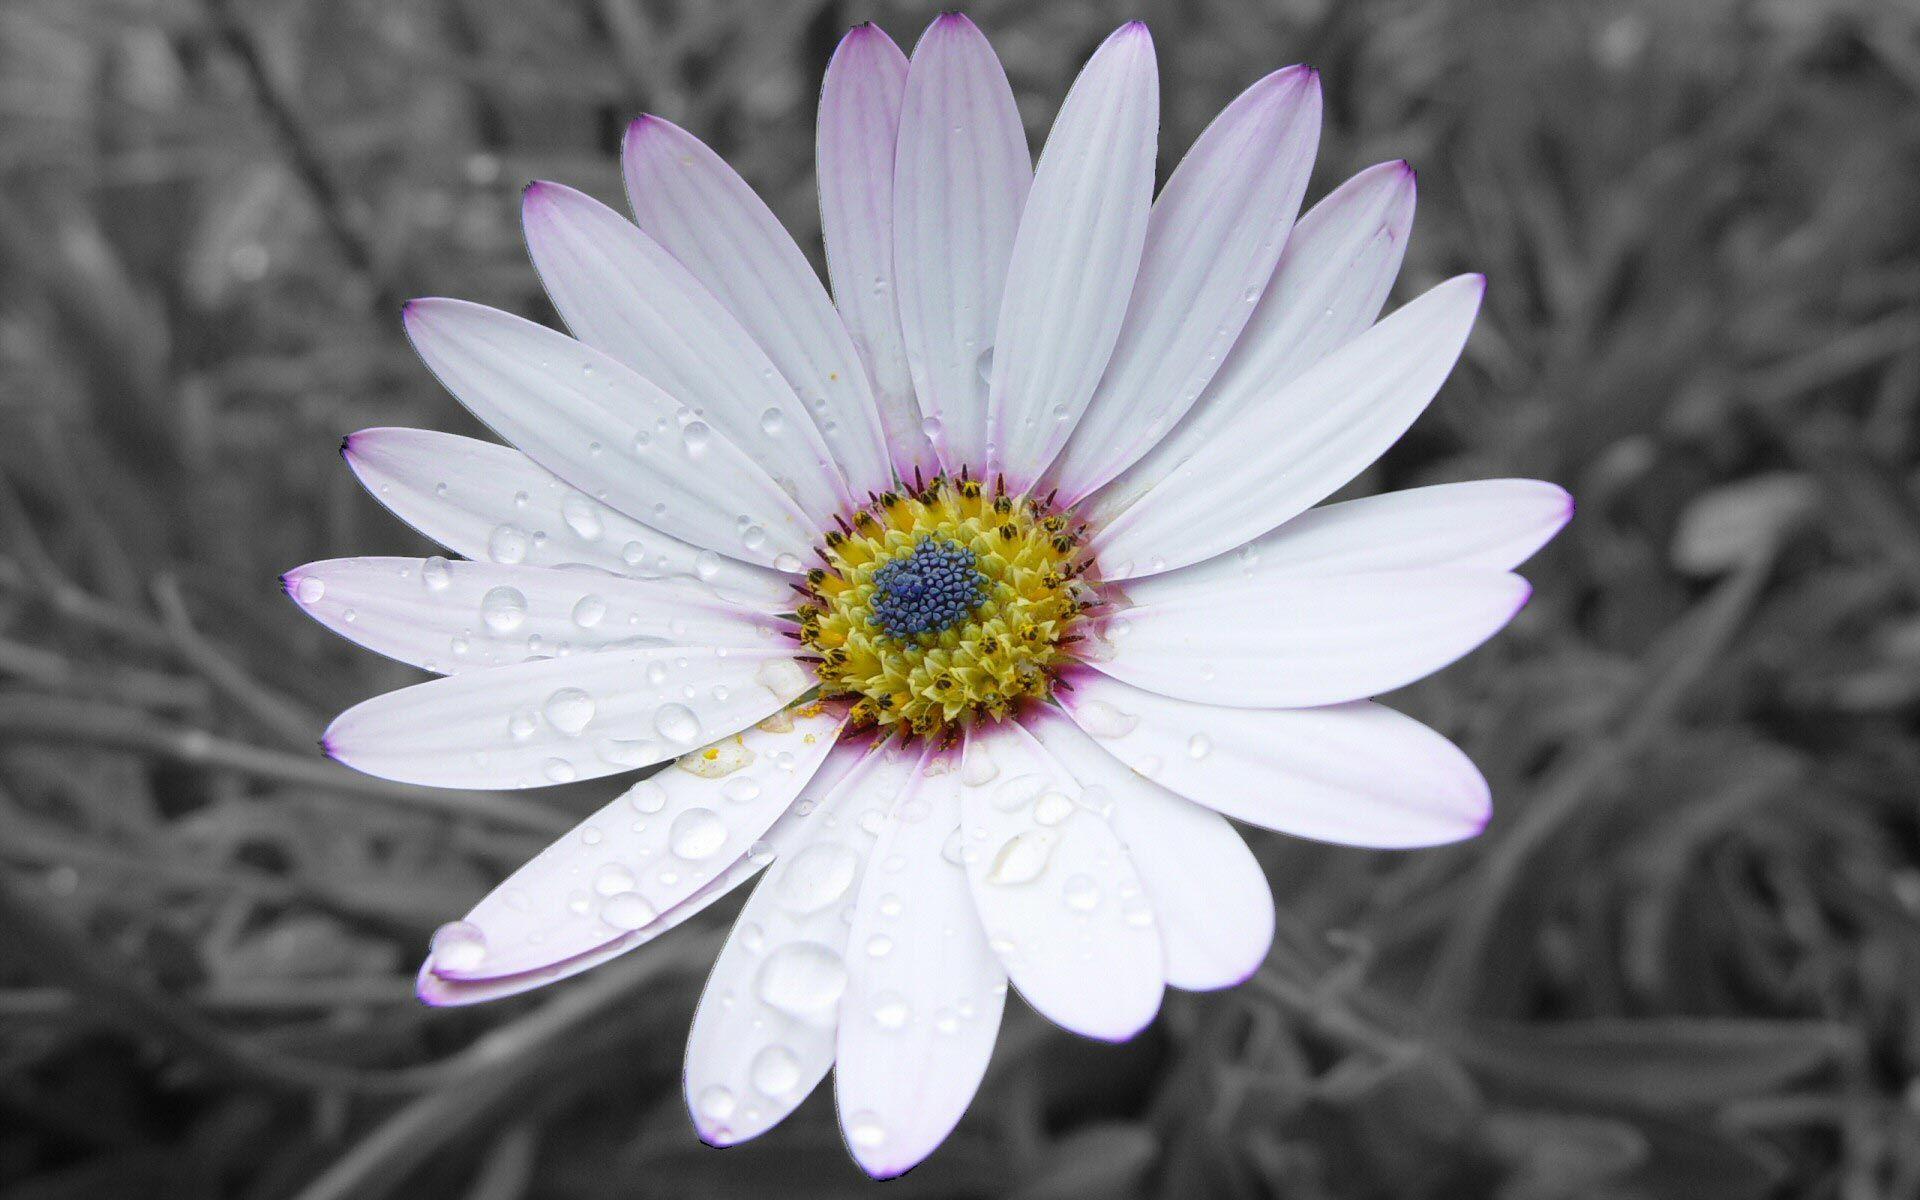 White   White Flower « Flowers & Grass « Nature « wallpapersfor.me